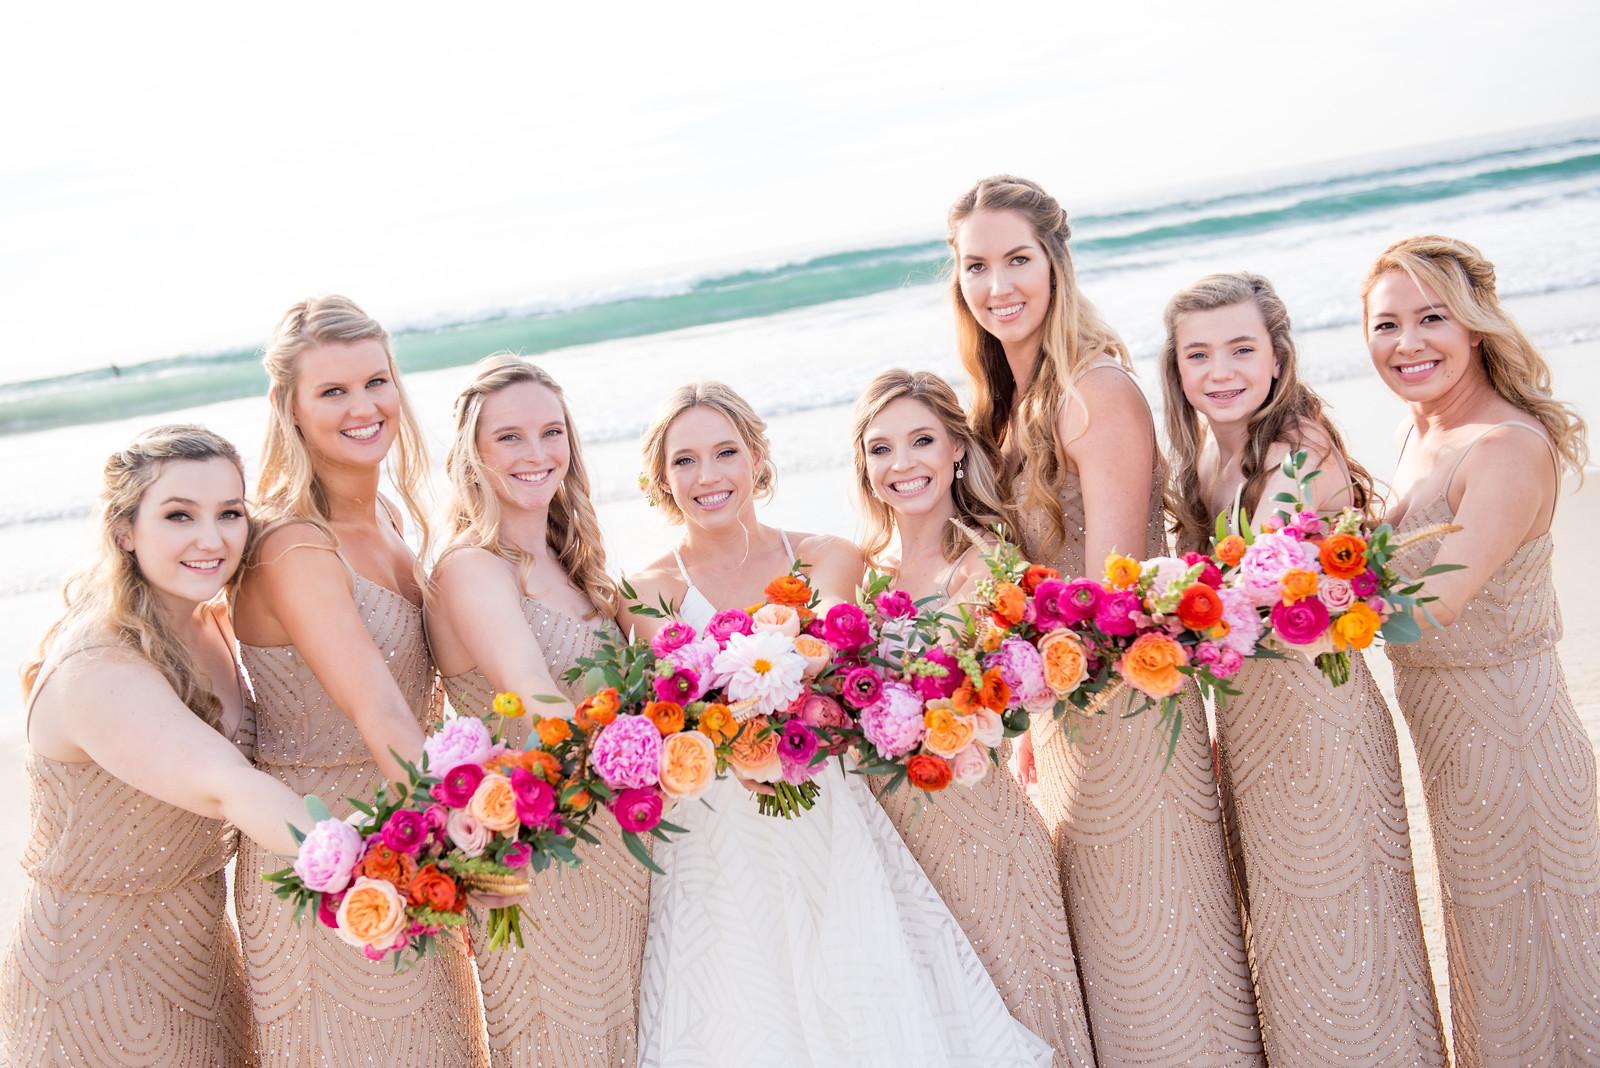 bridesmaids 4.jpg